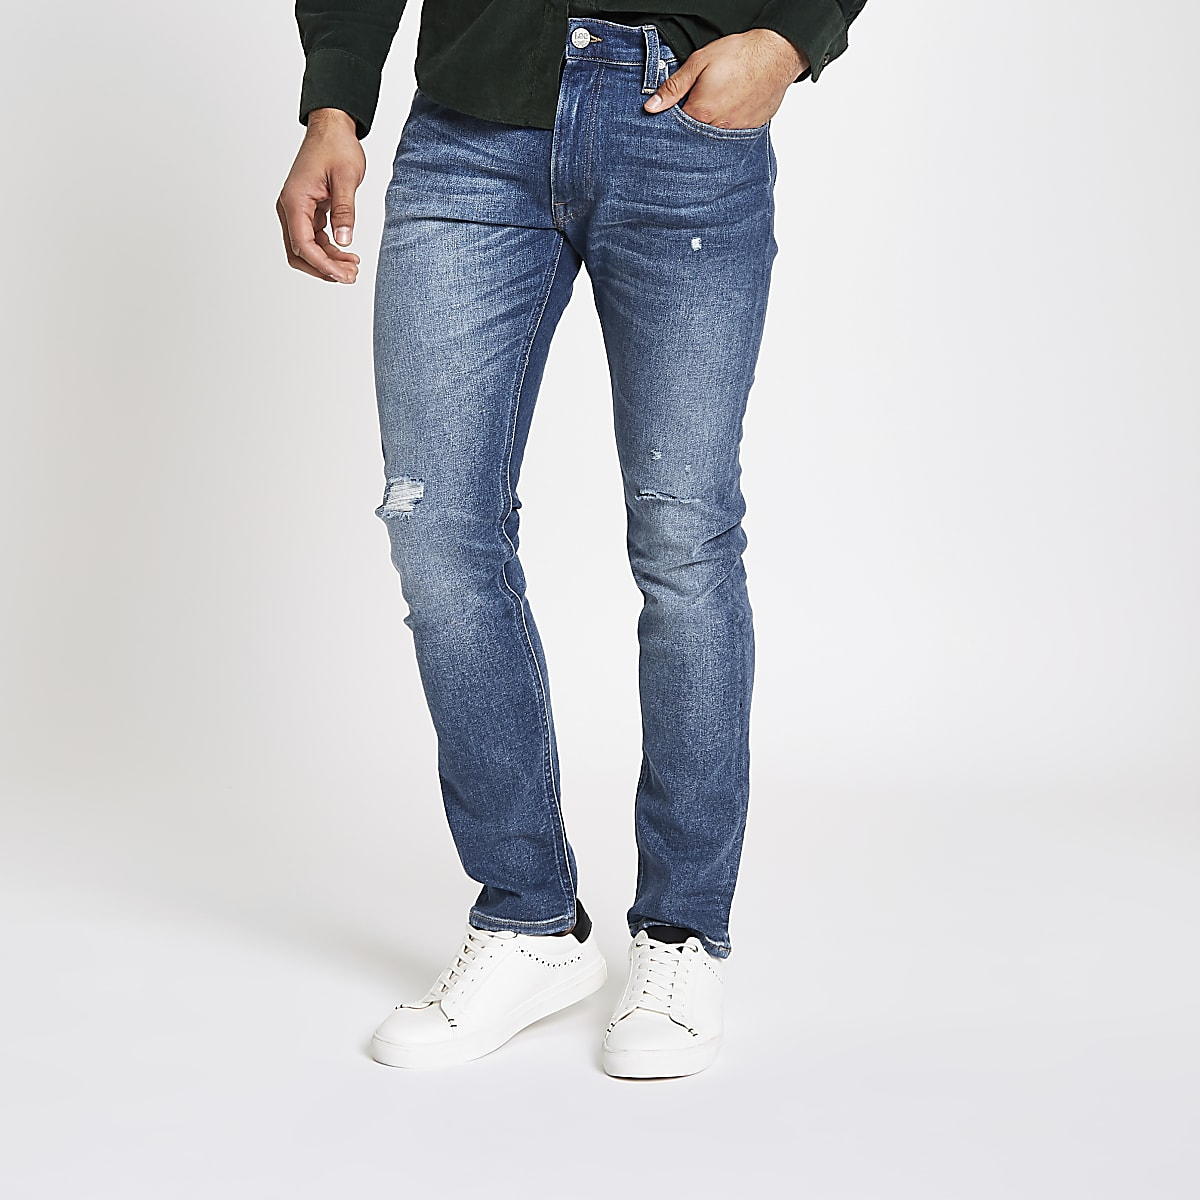 Lee - Luke - Blauwe ripped smaltoelopende slim-fit jeans